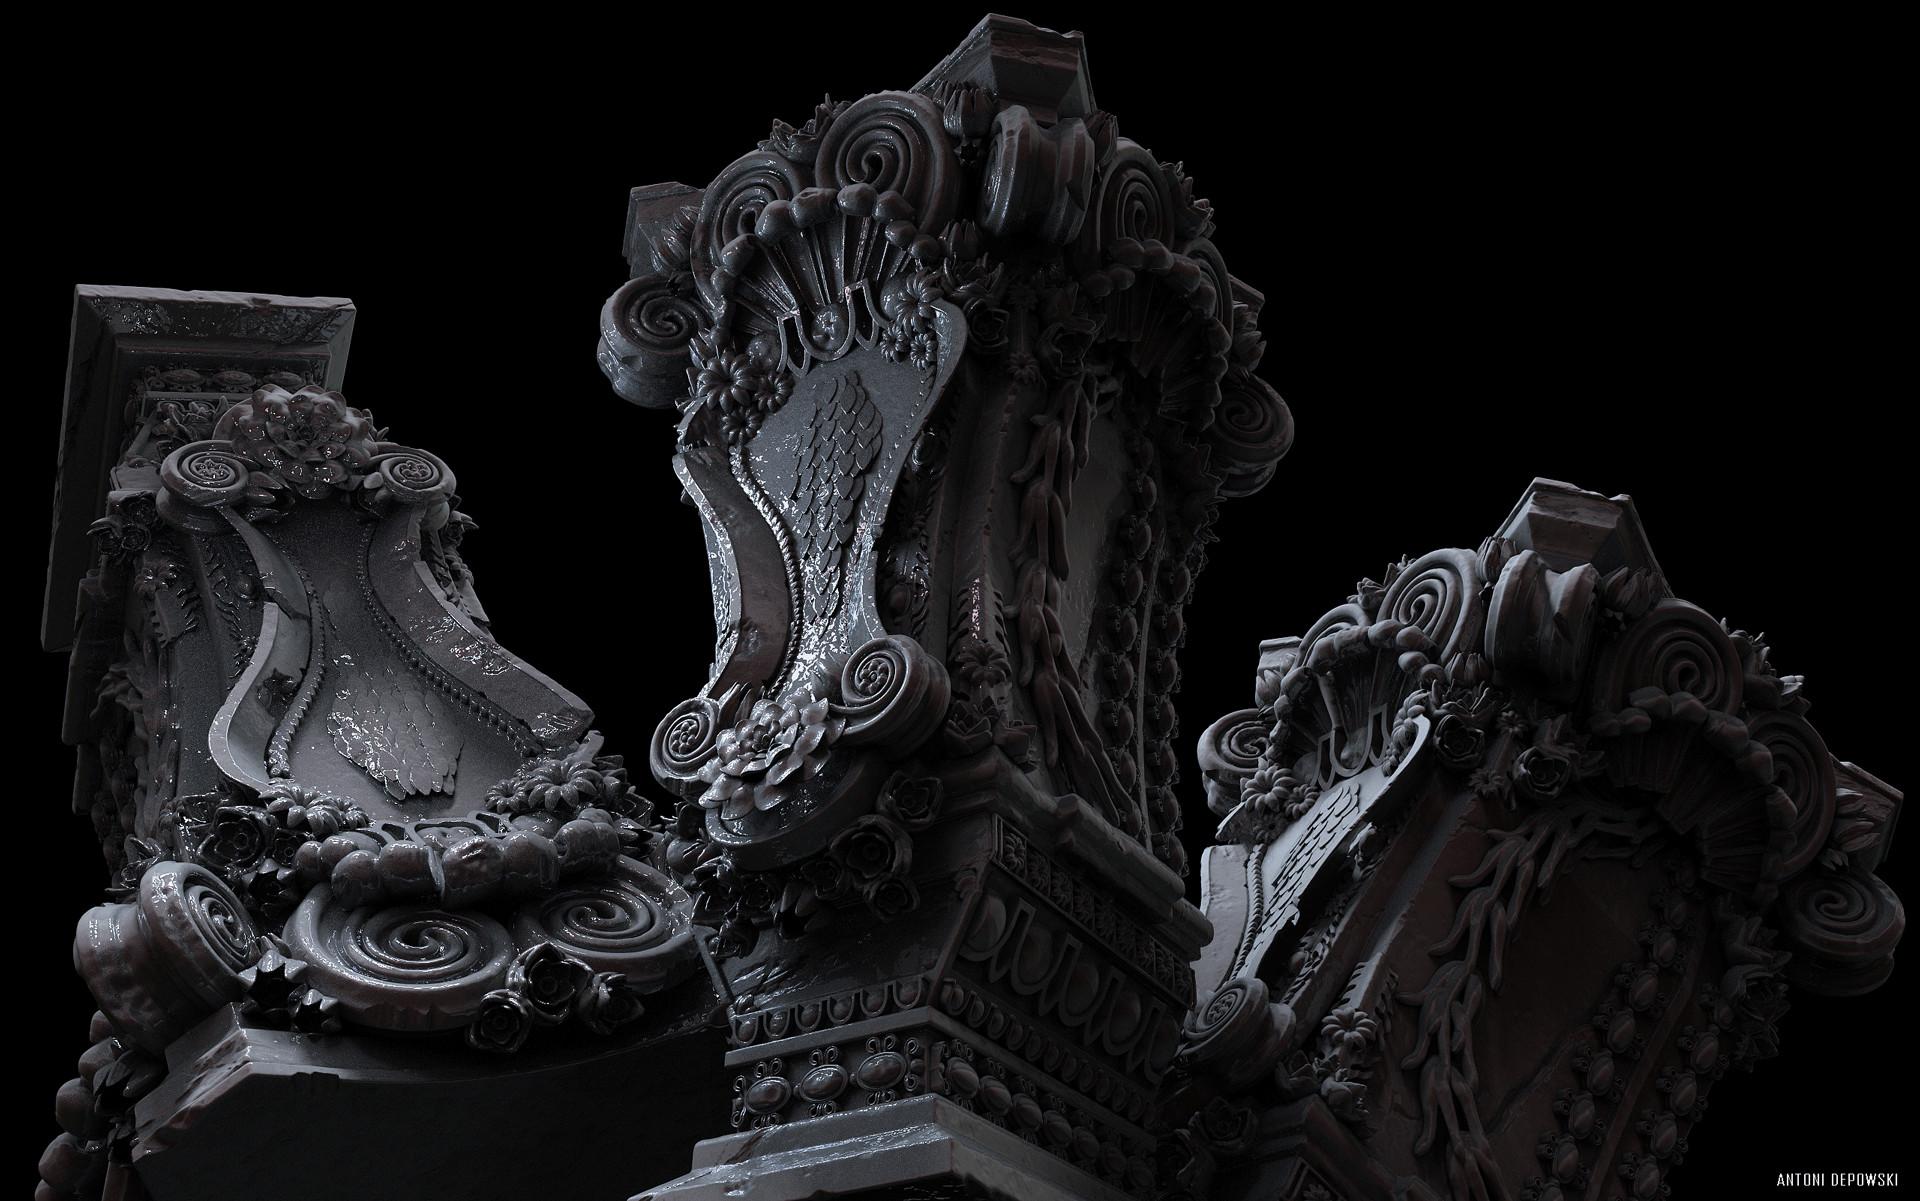 Antoni depowski baroque pedestal 5